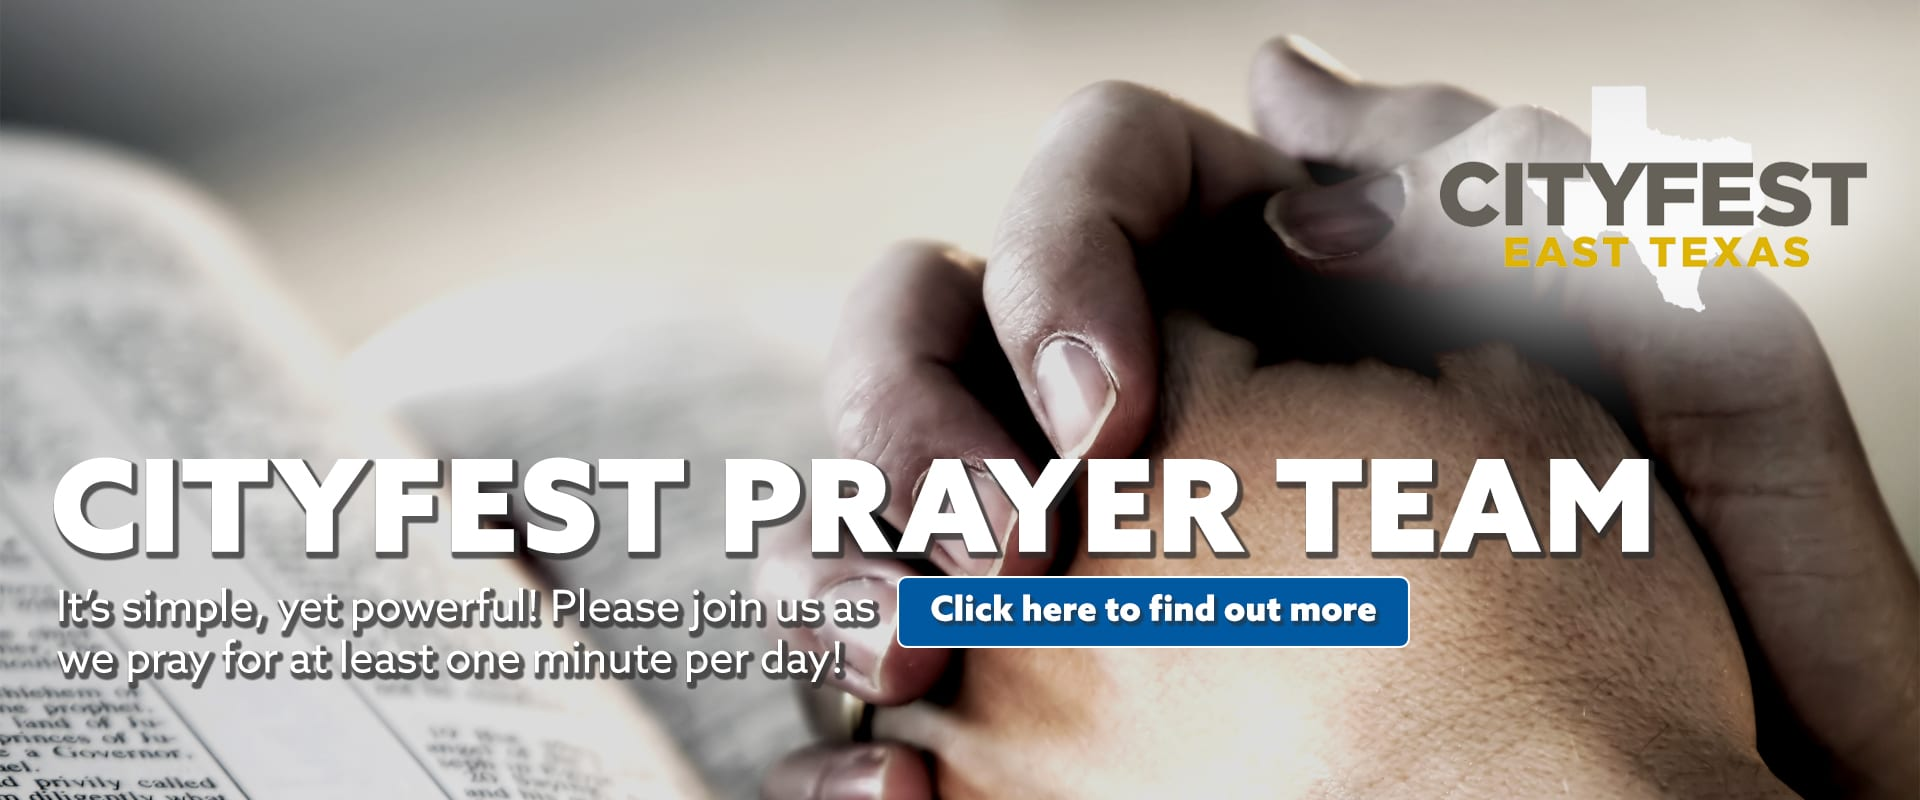 CityFest_KGLY_PrayerTeam